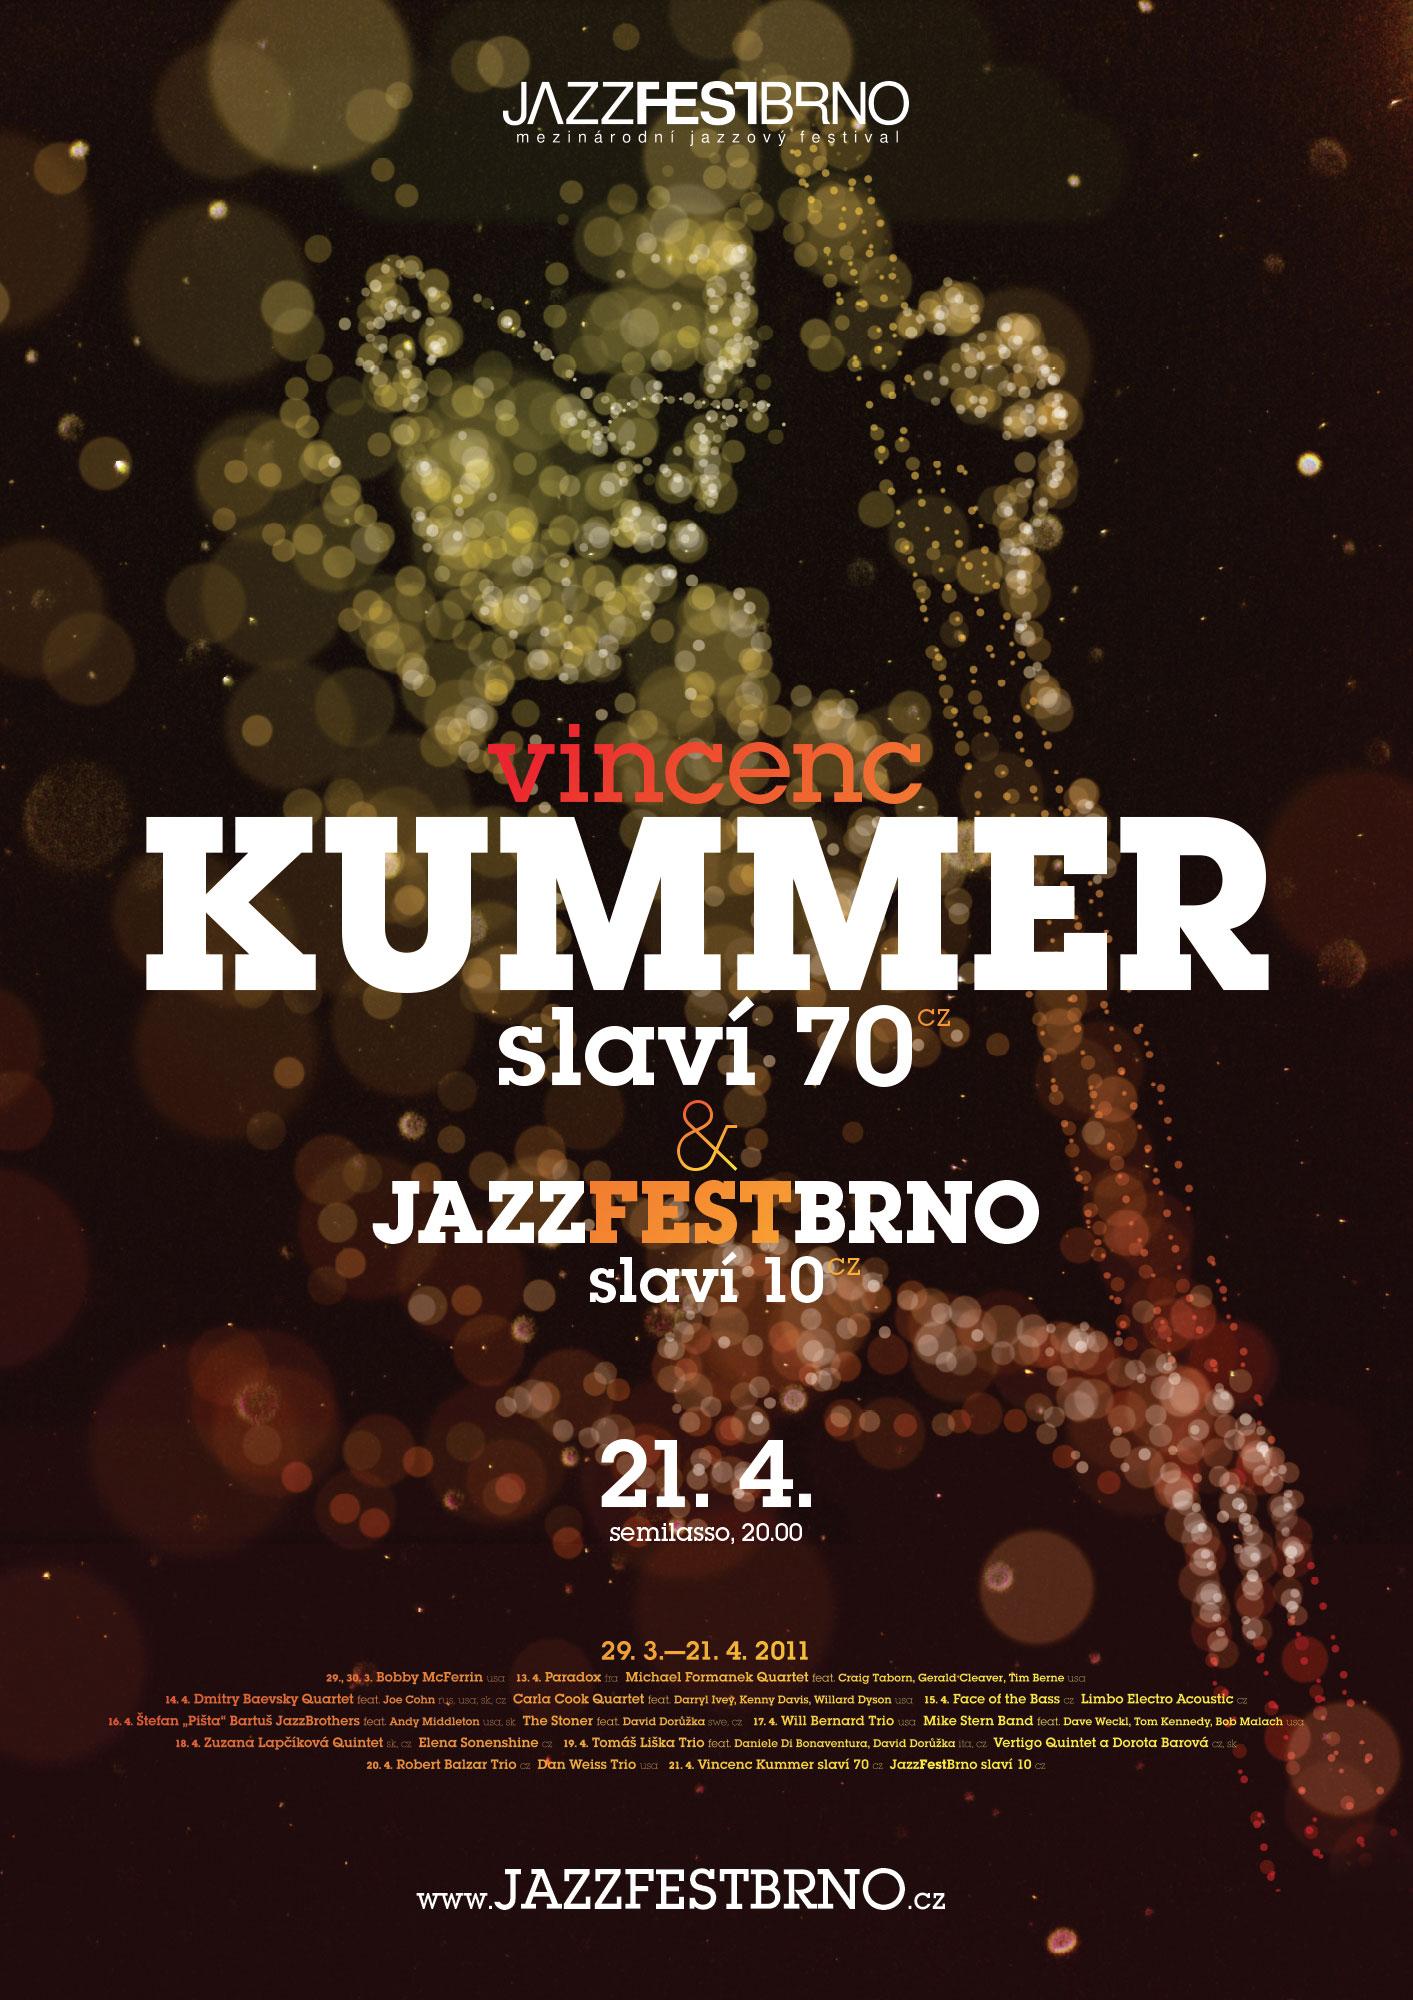 JazzFestBrno 2011 – Vincenc Kummer